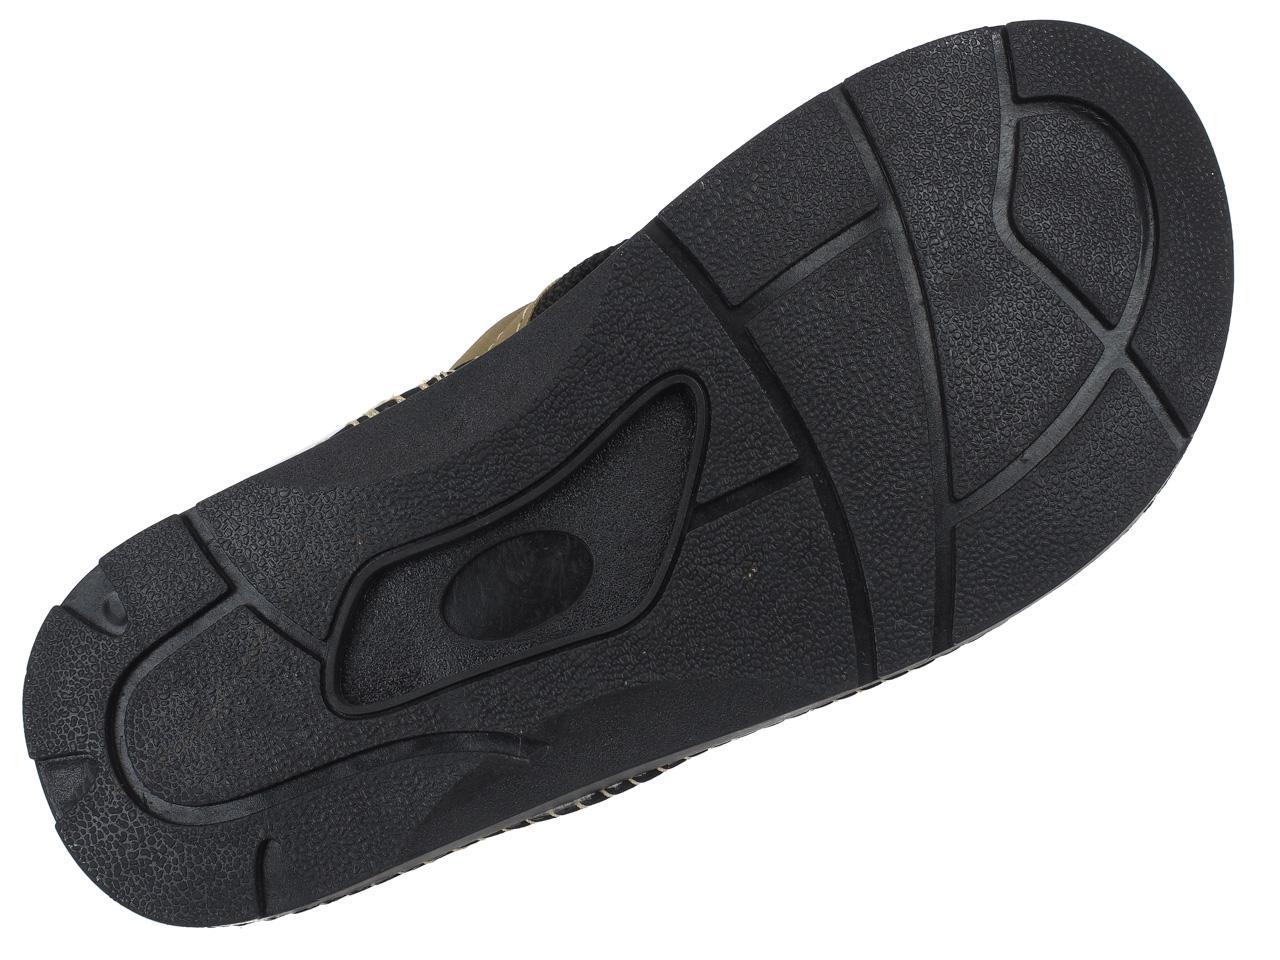 Flip-Flops-Tap-Dance-Shoes-Treeker9-Barbados-Beige-Flip-Flop-H-Beige-77481-New thumbnail 4